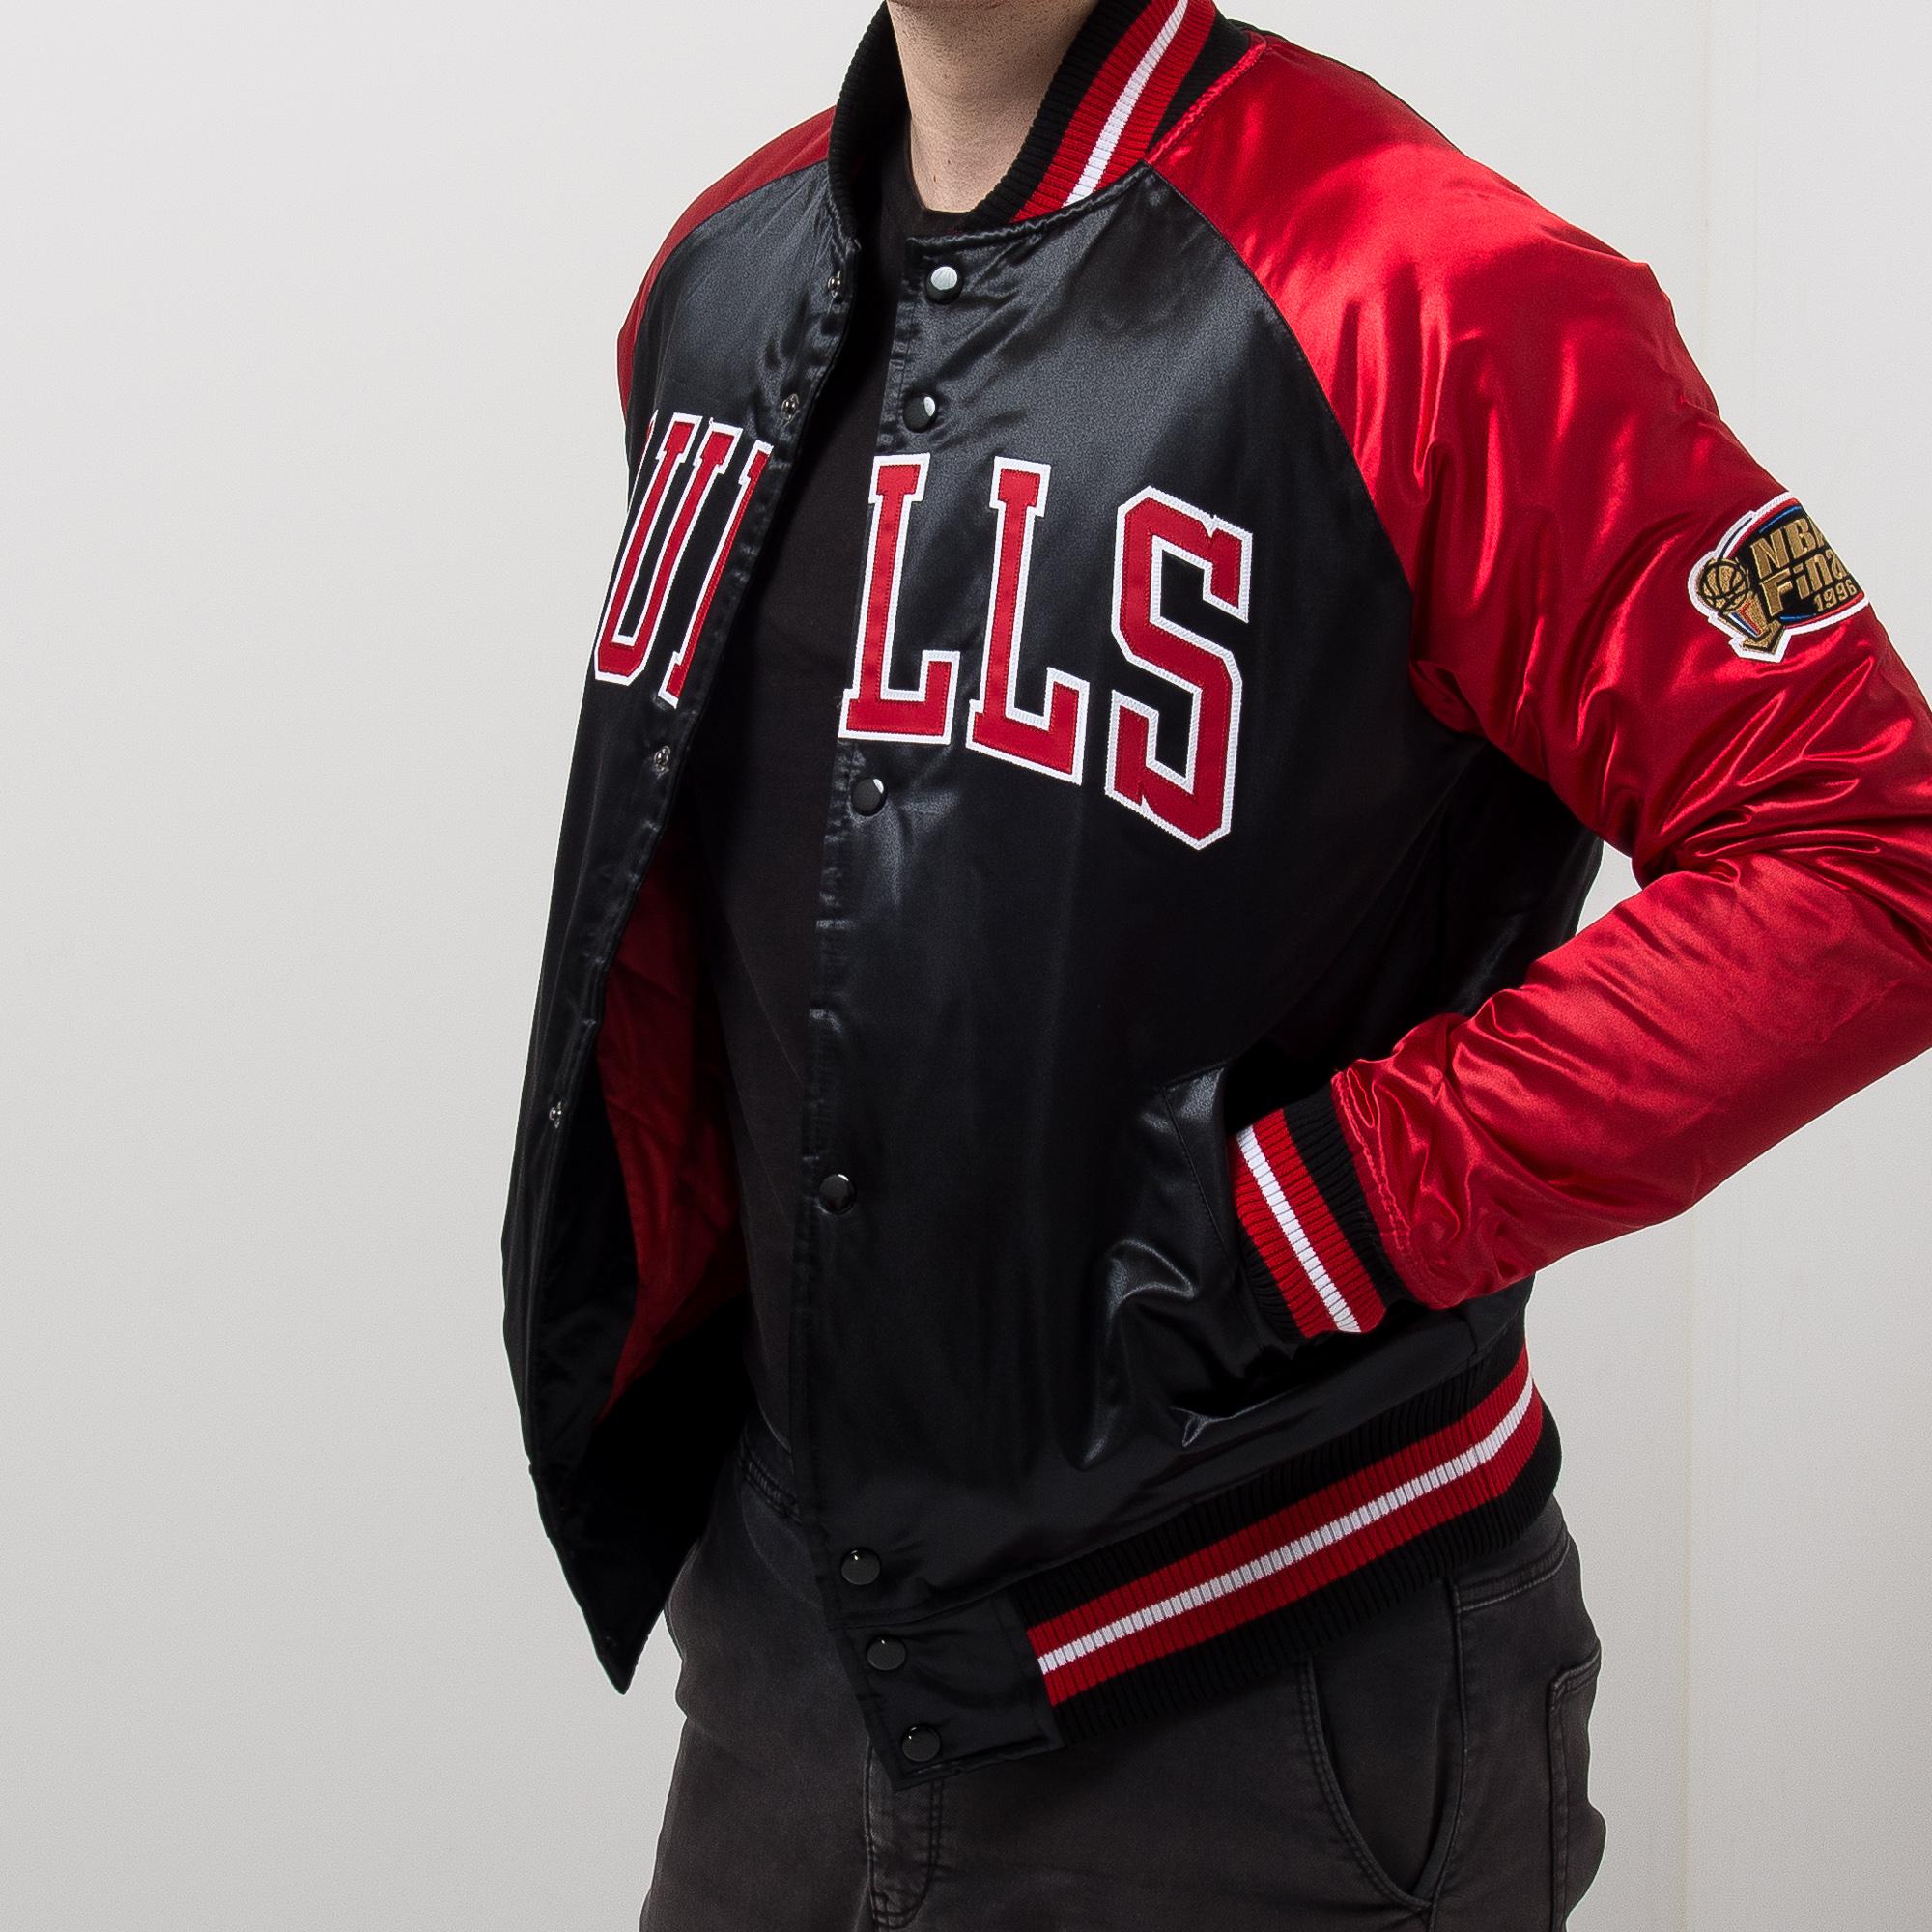 c3684db69 Mitchell & Ness NBA Chicago Bulls Tough Season Satin Jacket - NBA Shop Chicago  Bulls Merchandise - Superfanas.lt